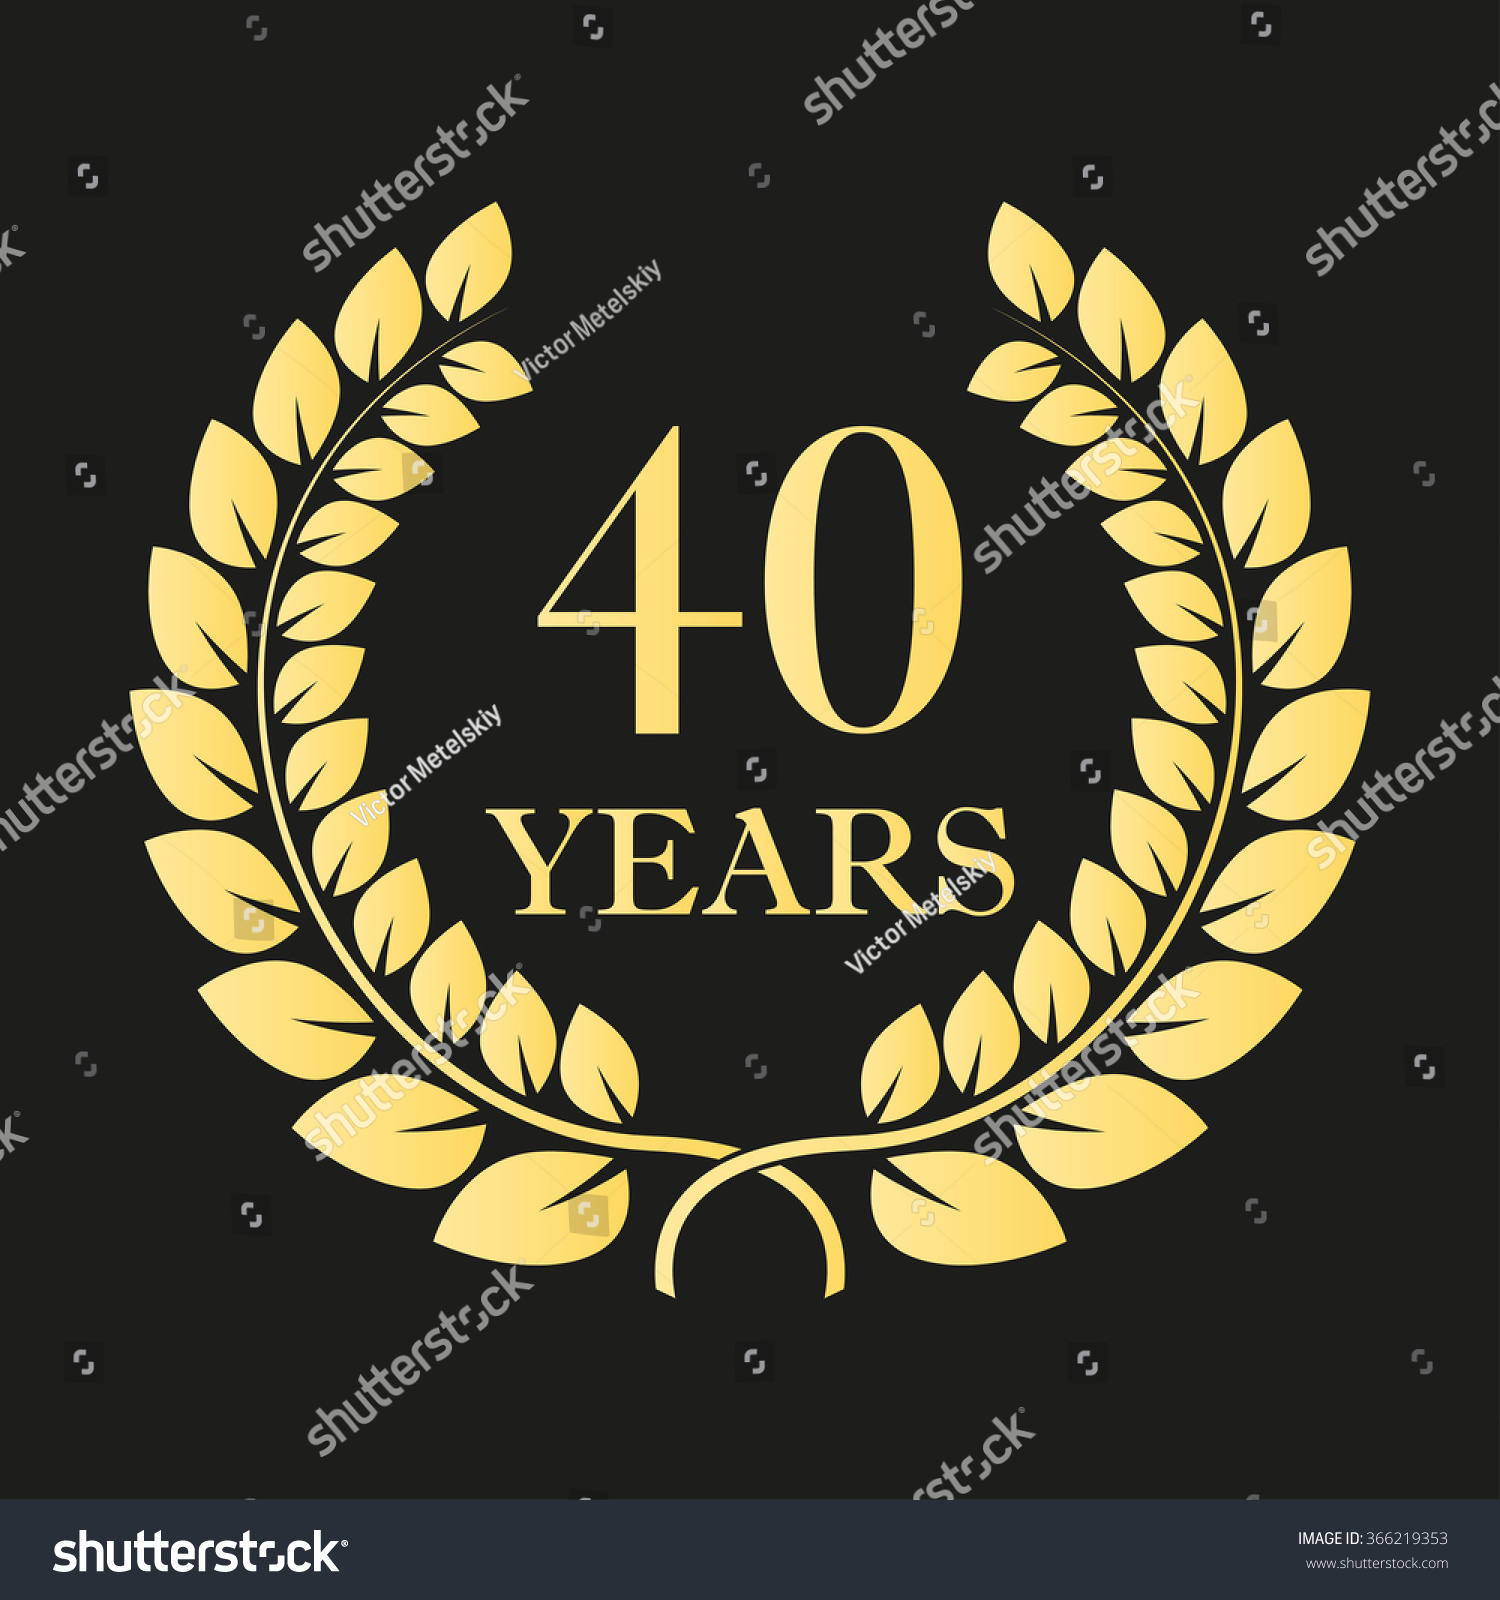 40 Years Anniversary Laurel Wreath Icon Stock Illustration Royalty